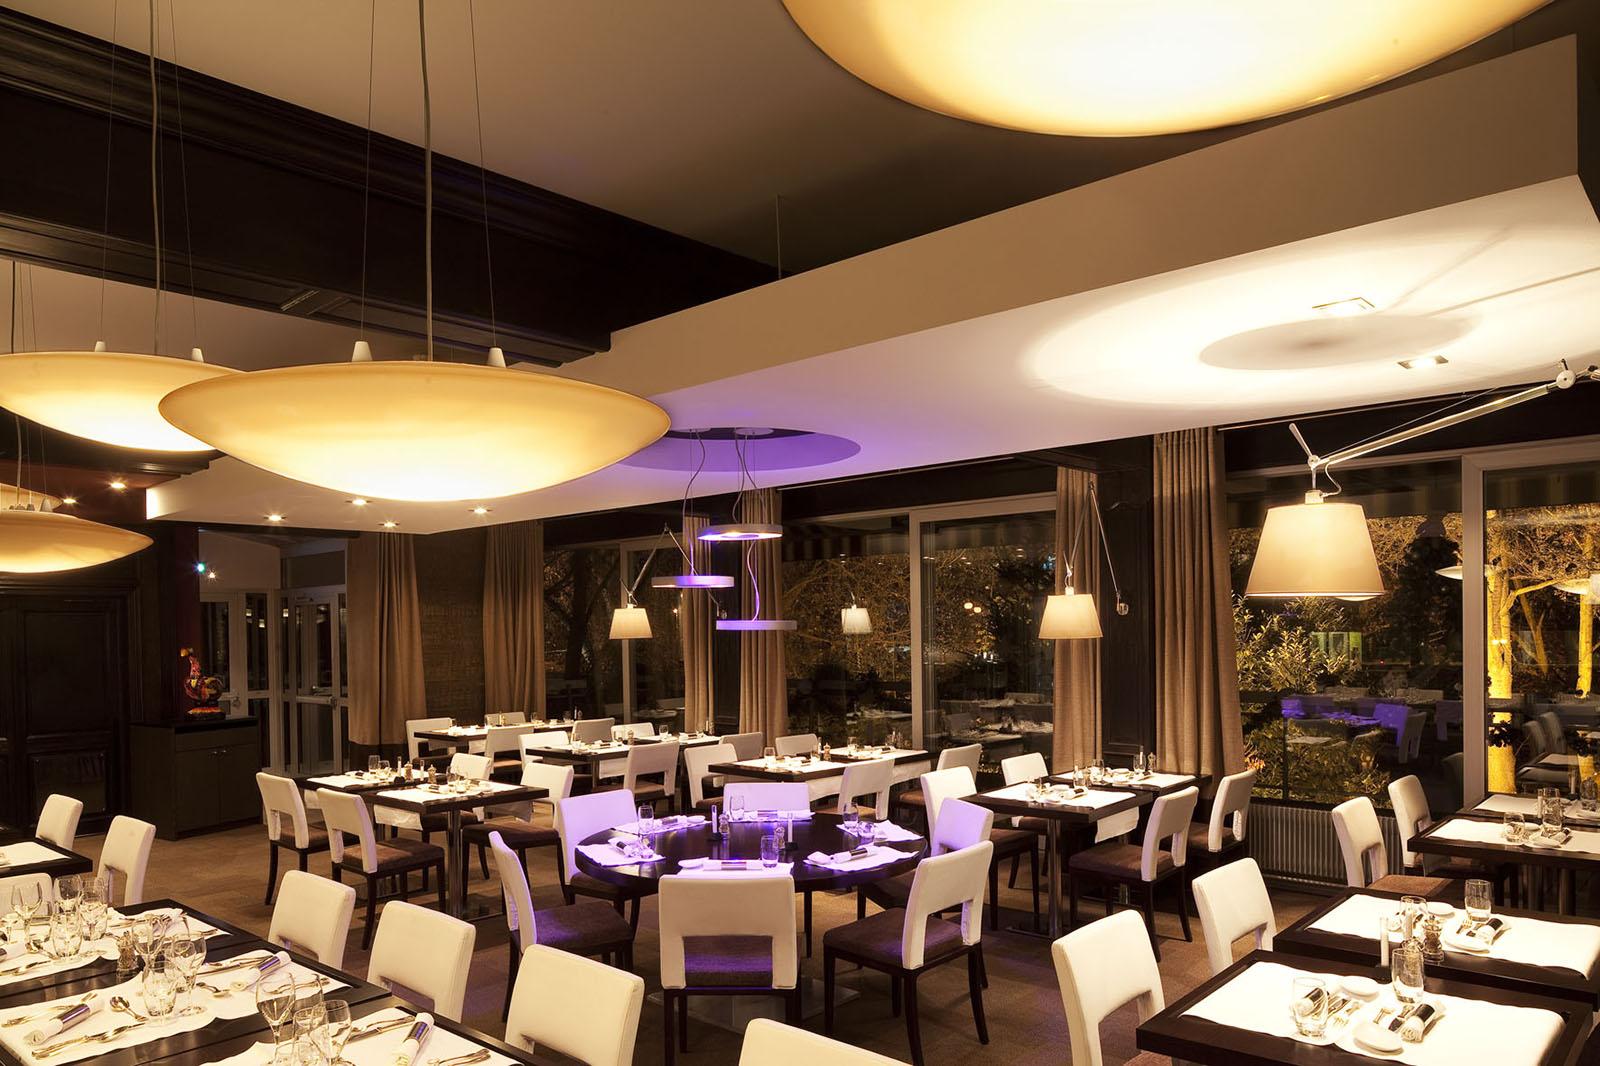 Restaurant Diana Molsheim En Alsace Dans Le Bas Rhin Dpt 67